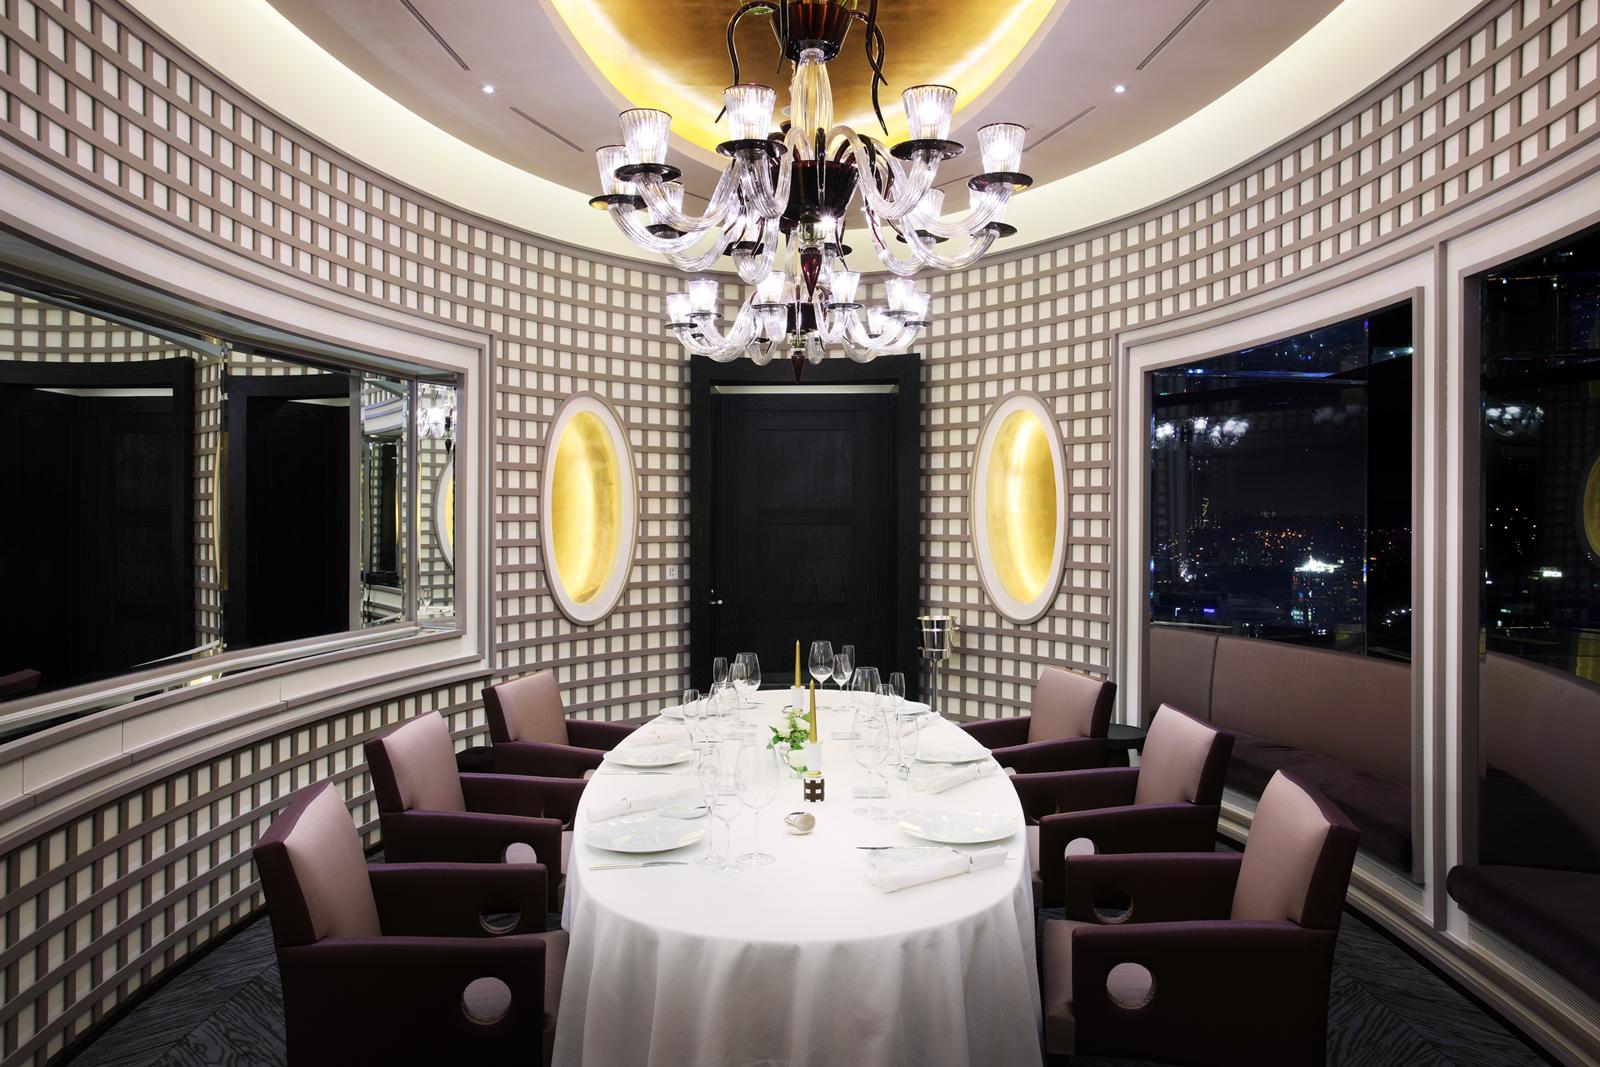 pierre-gagnaire-restaurant-seoul-olivier-gagnere-veronese-12